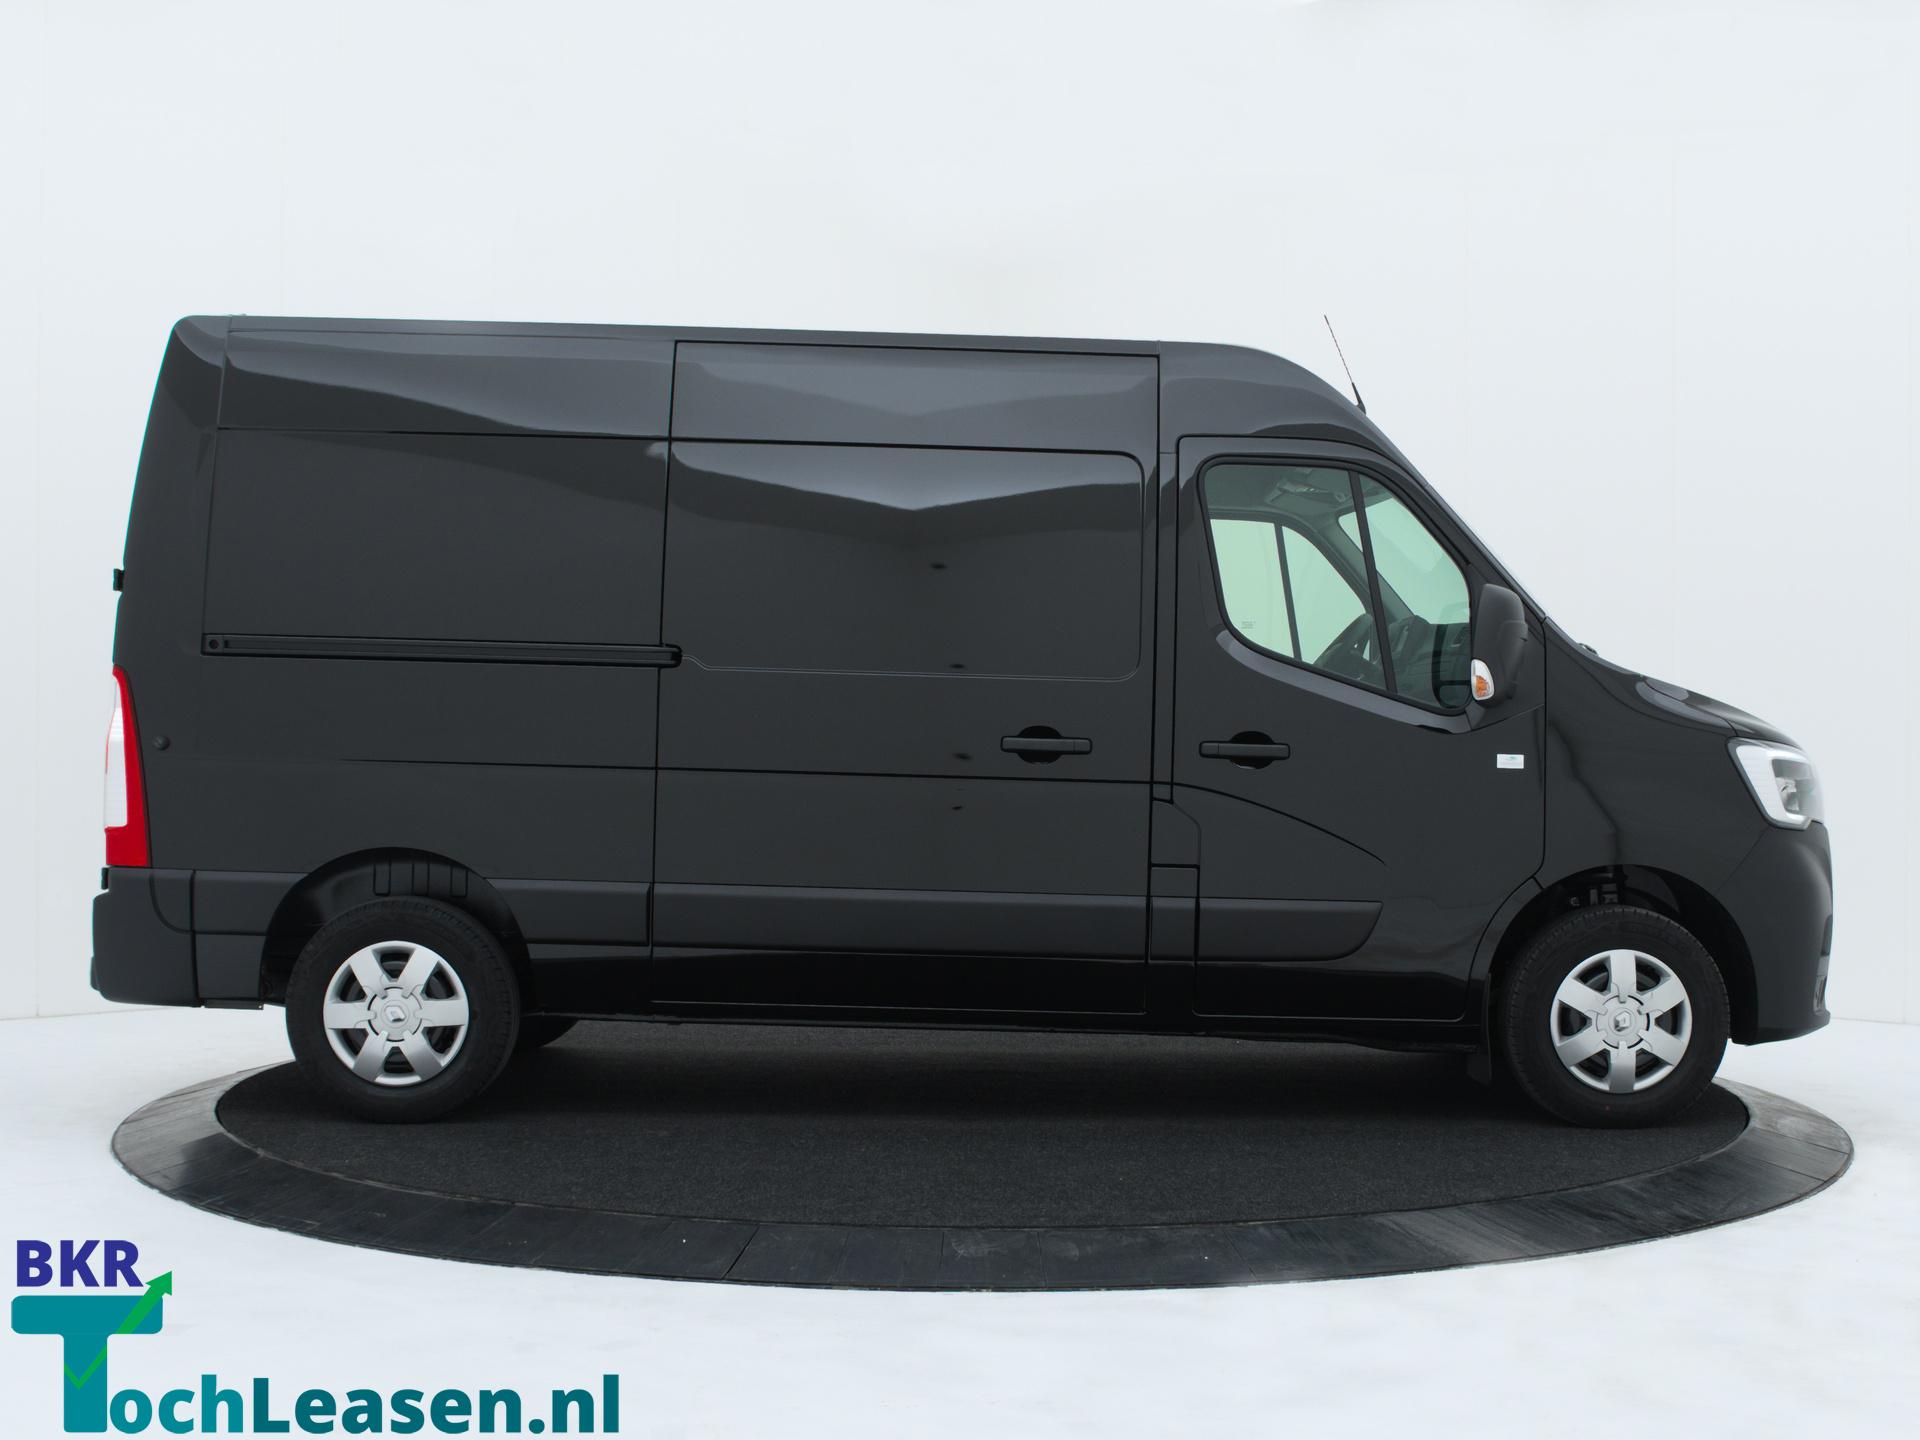 Renault Master L2H2 180 pk zwart zijkant 2 BKR toch Leasen